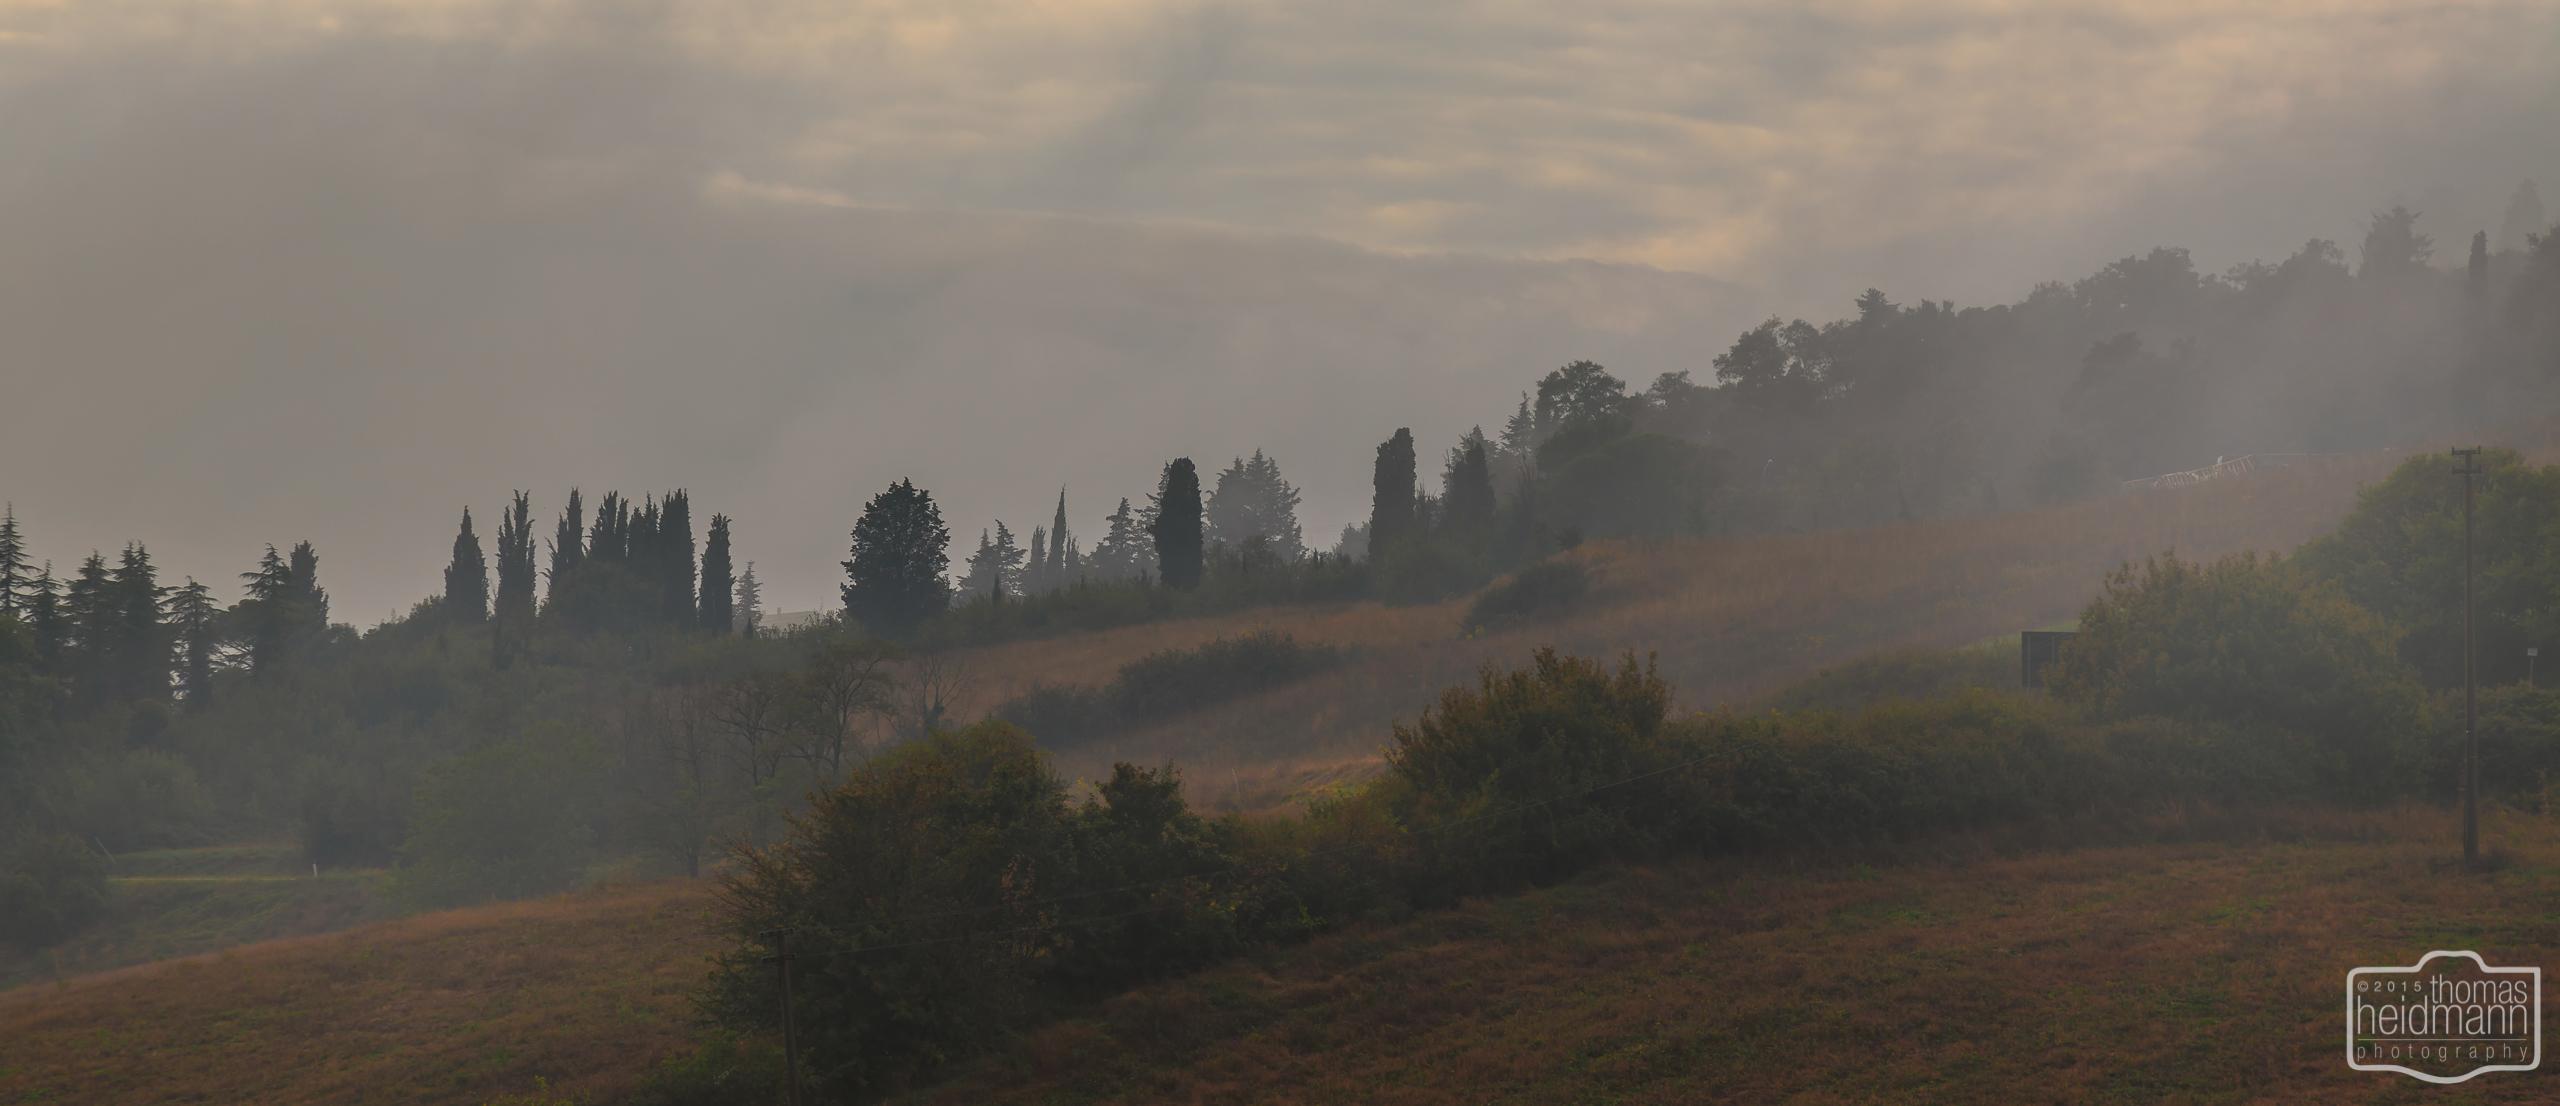 Gegend bei Radifocani (Süd-Toskana)